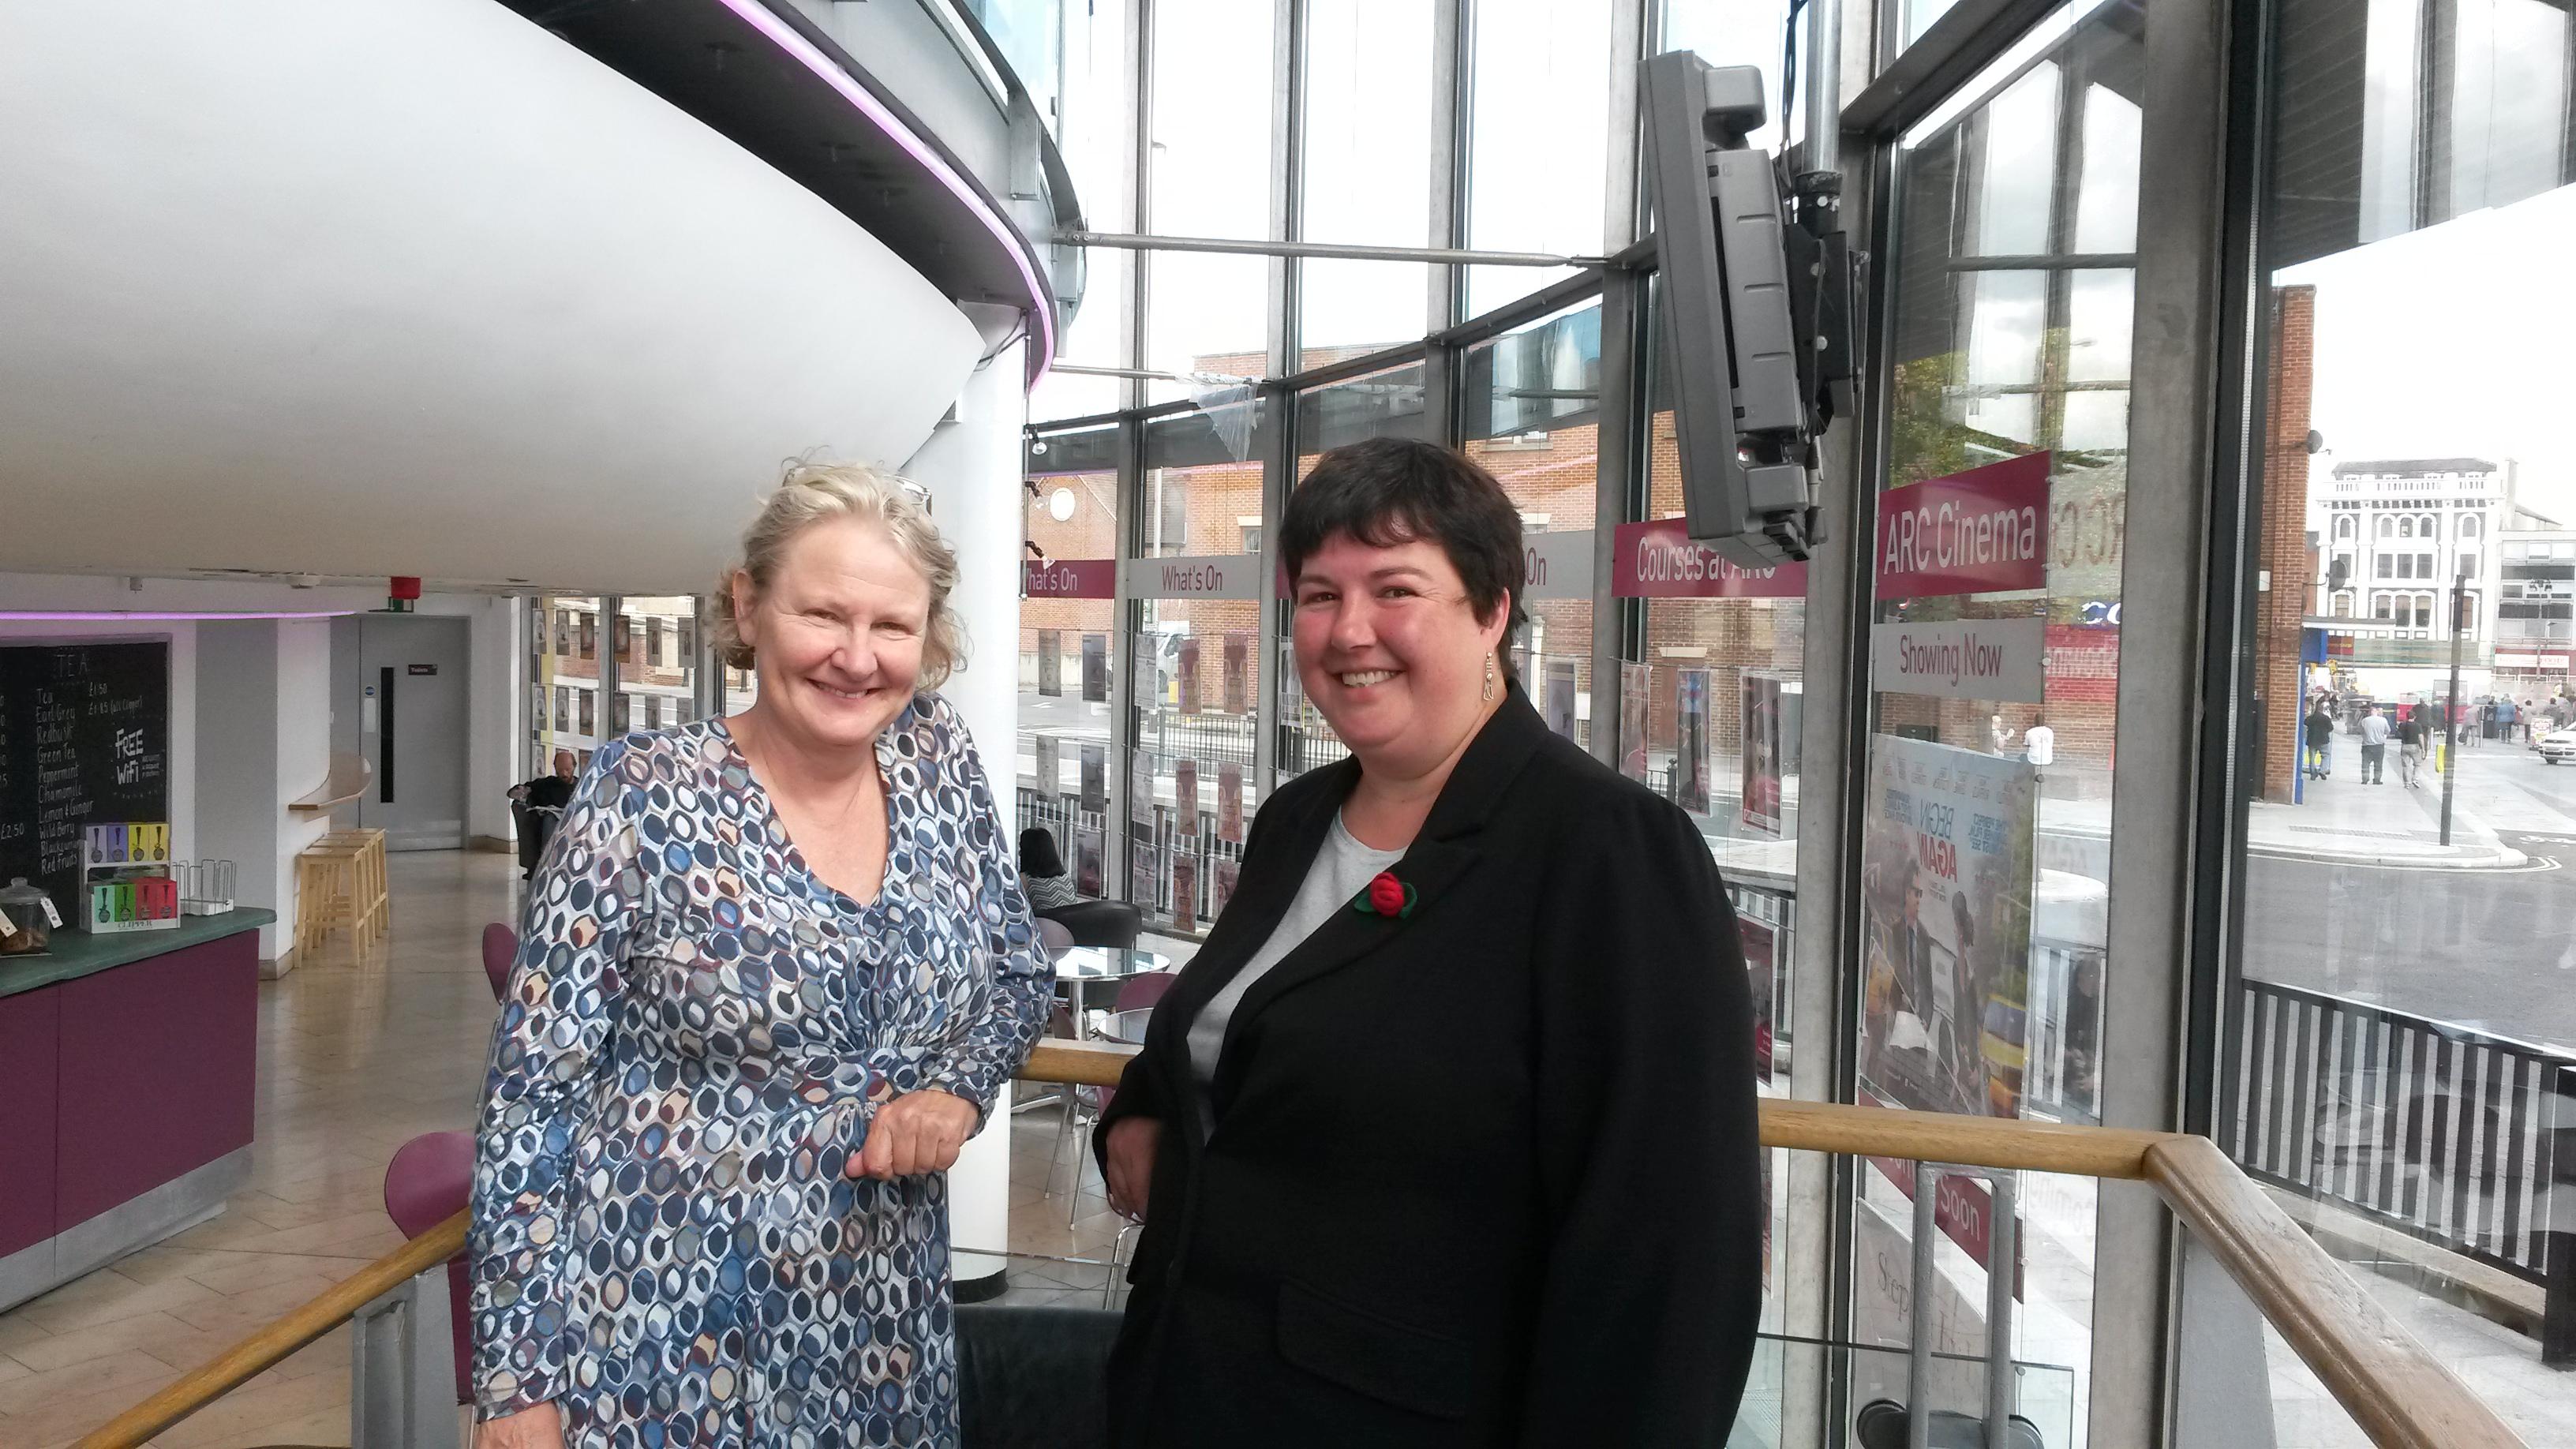 The_Arc_with_Helen_Goodman_MP.jpg